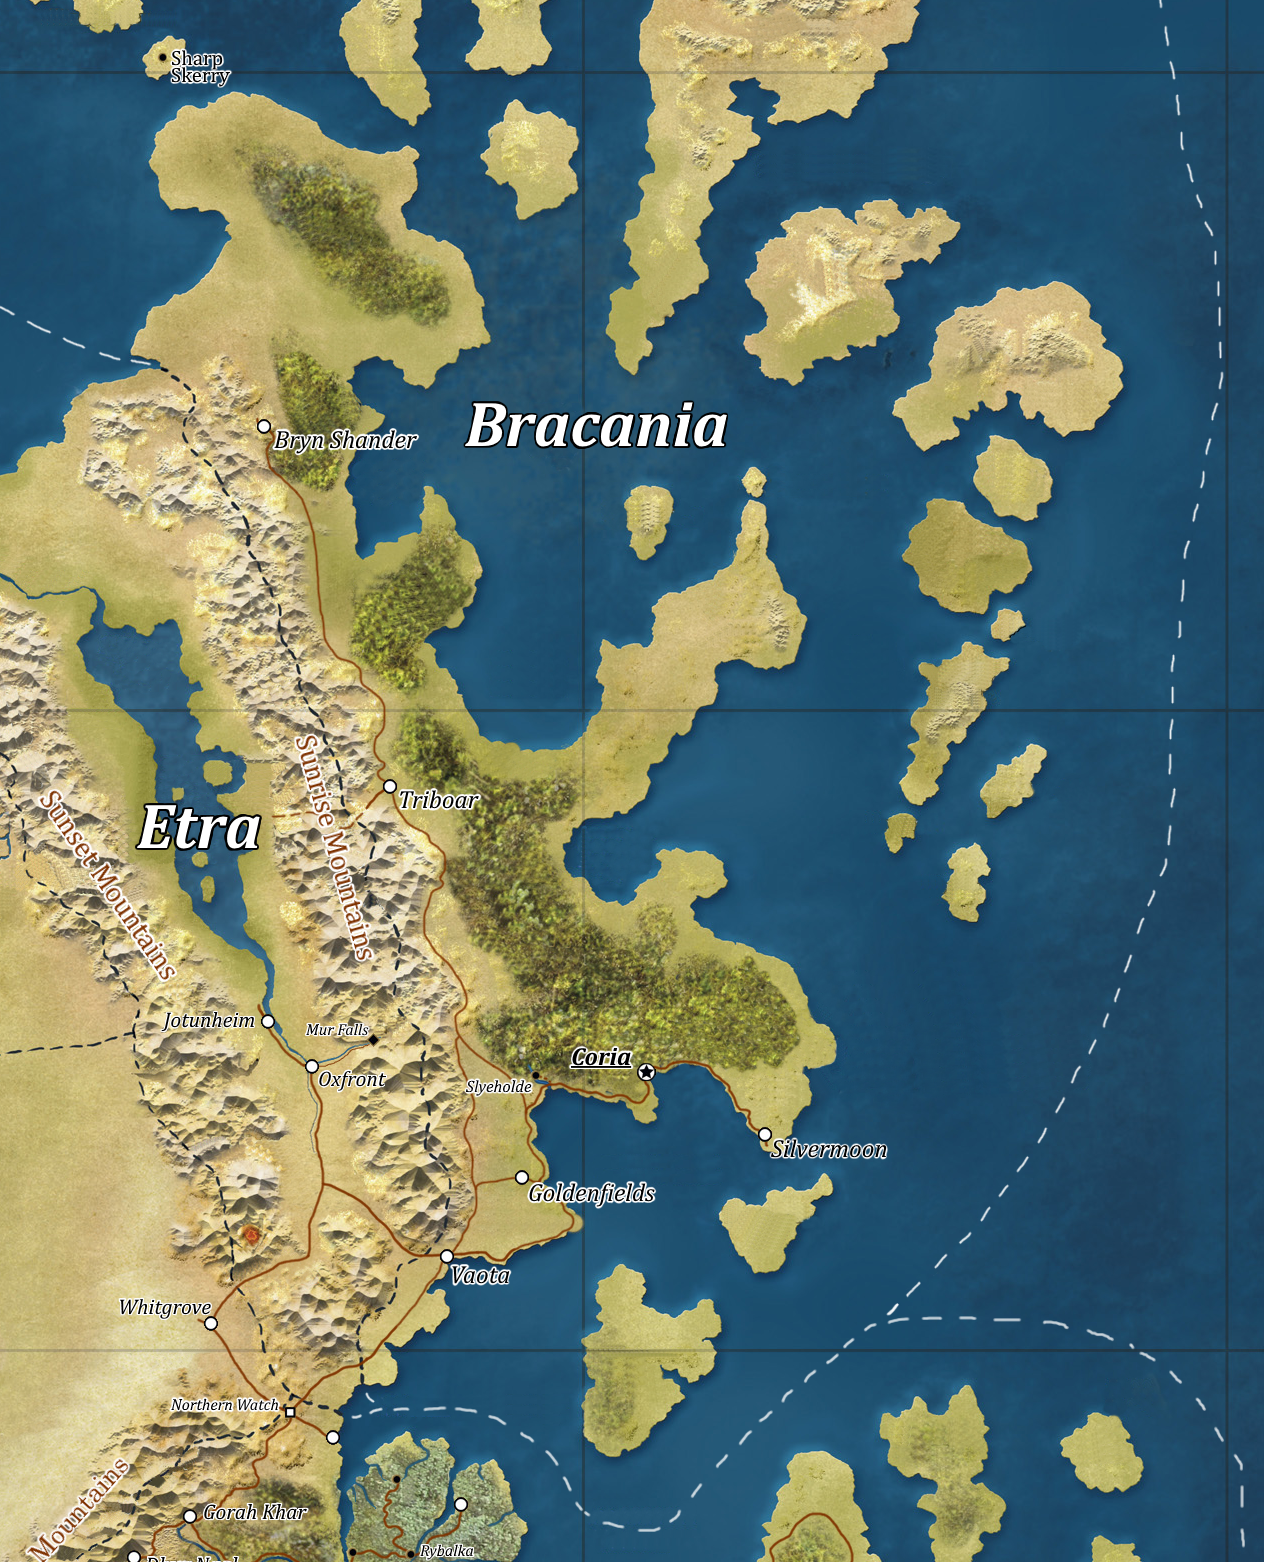 Bracania.png